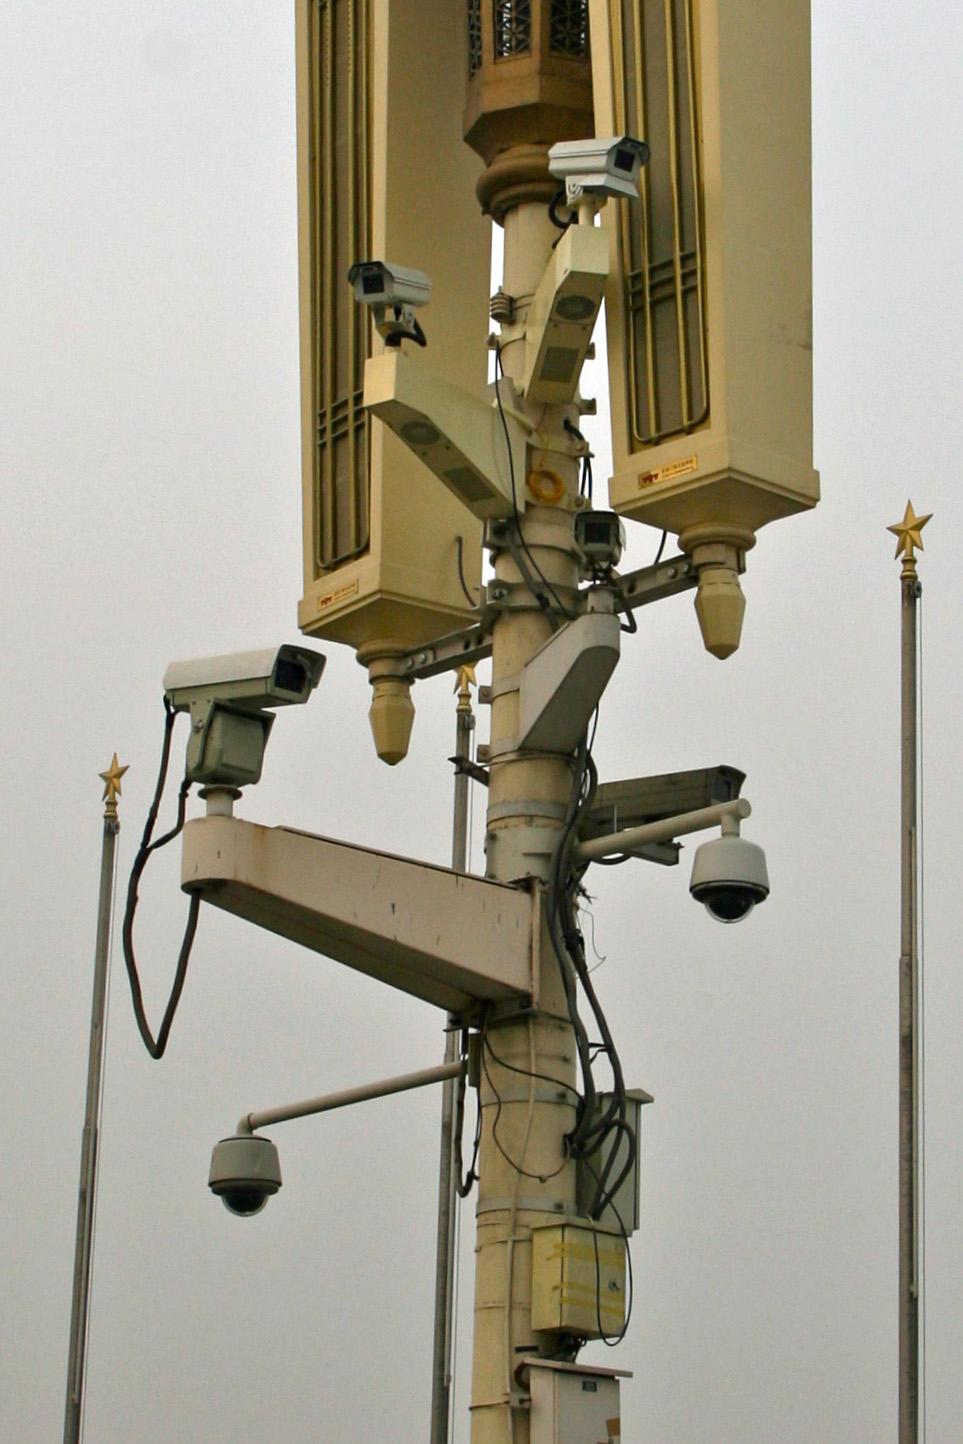 M surveillance in China - Wikipedia on